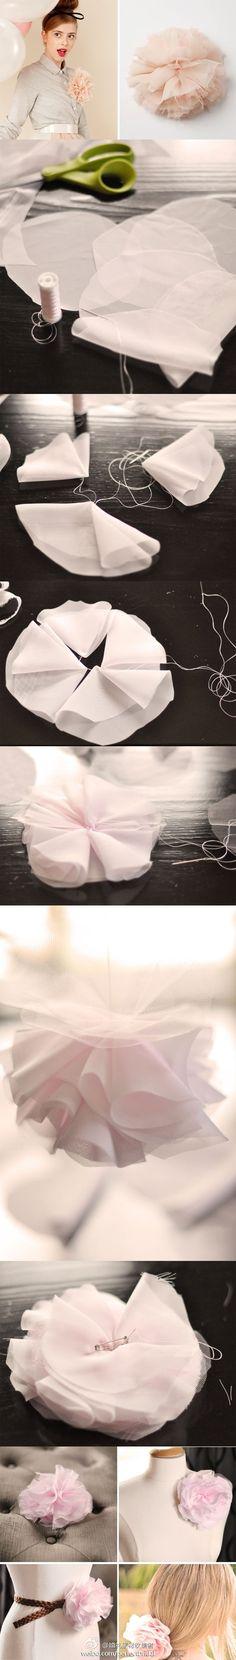 DIY tul rosa flores - glue a clip on the back to use as brooch or hair clip!